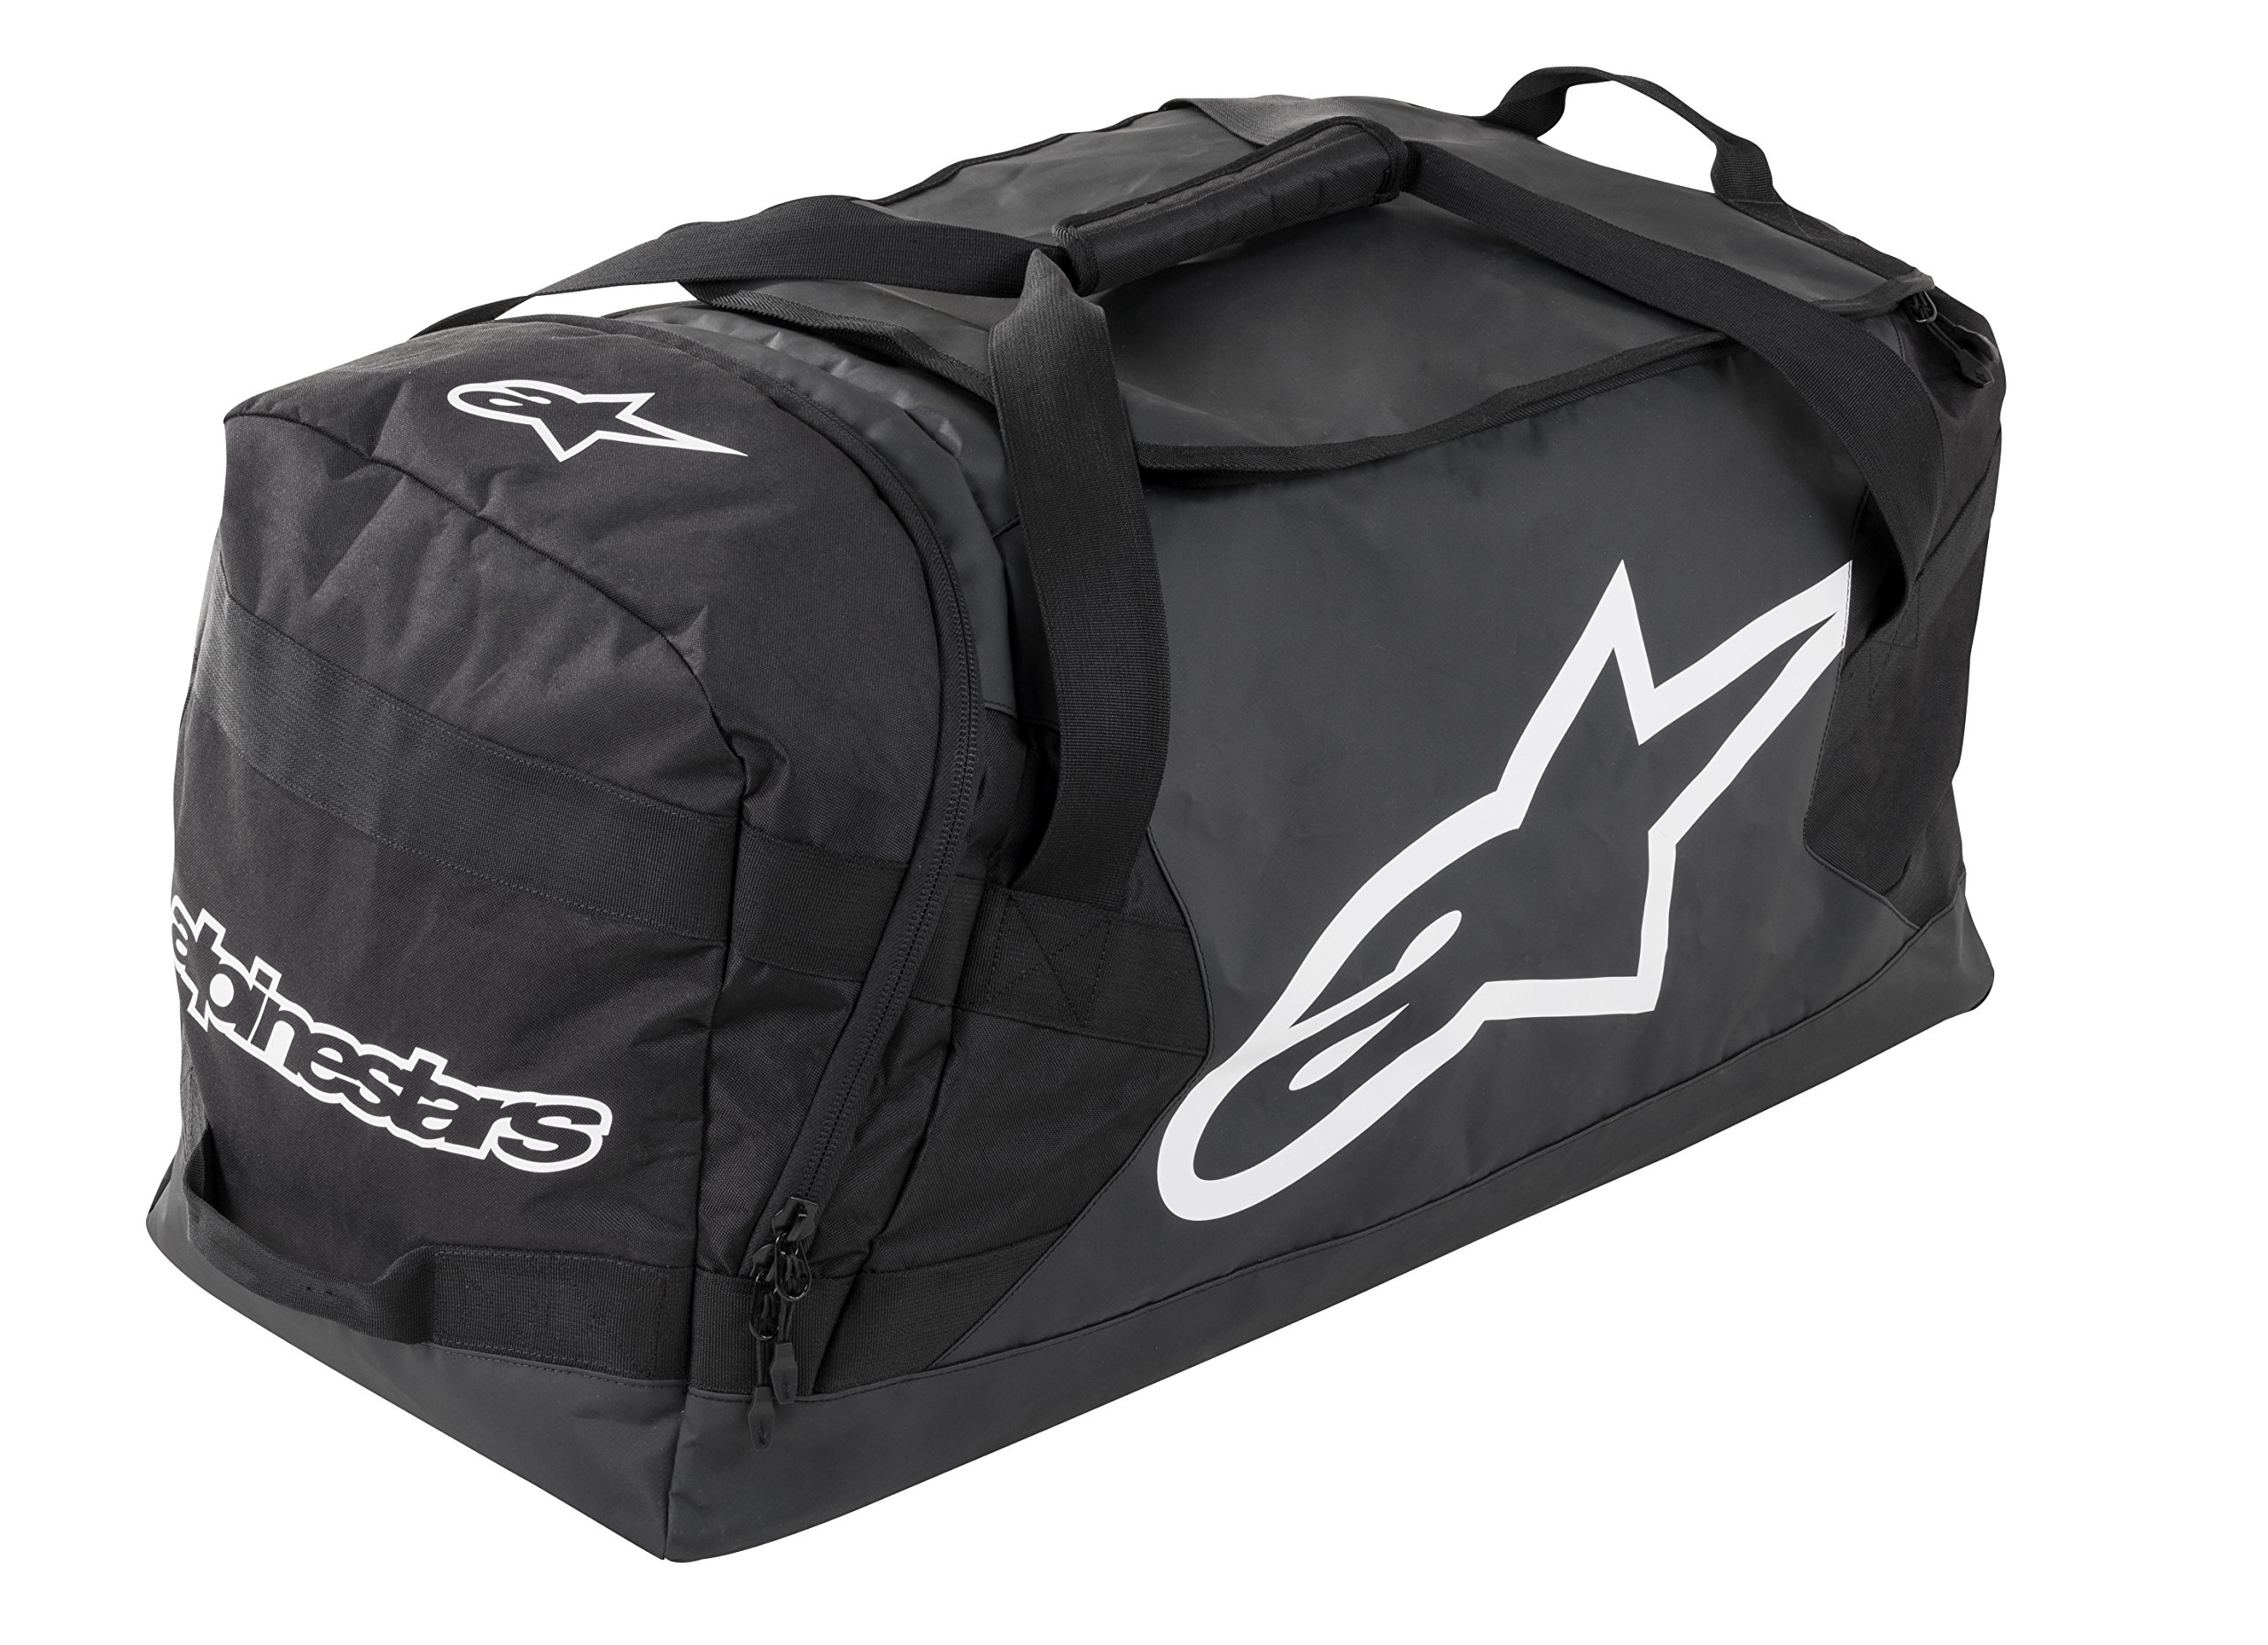 Goanna Duffle Bag